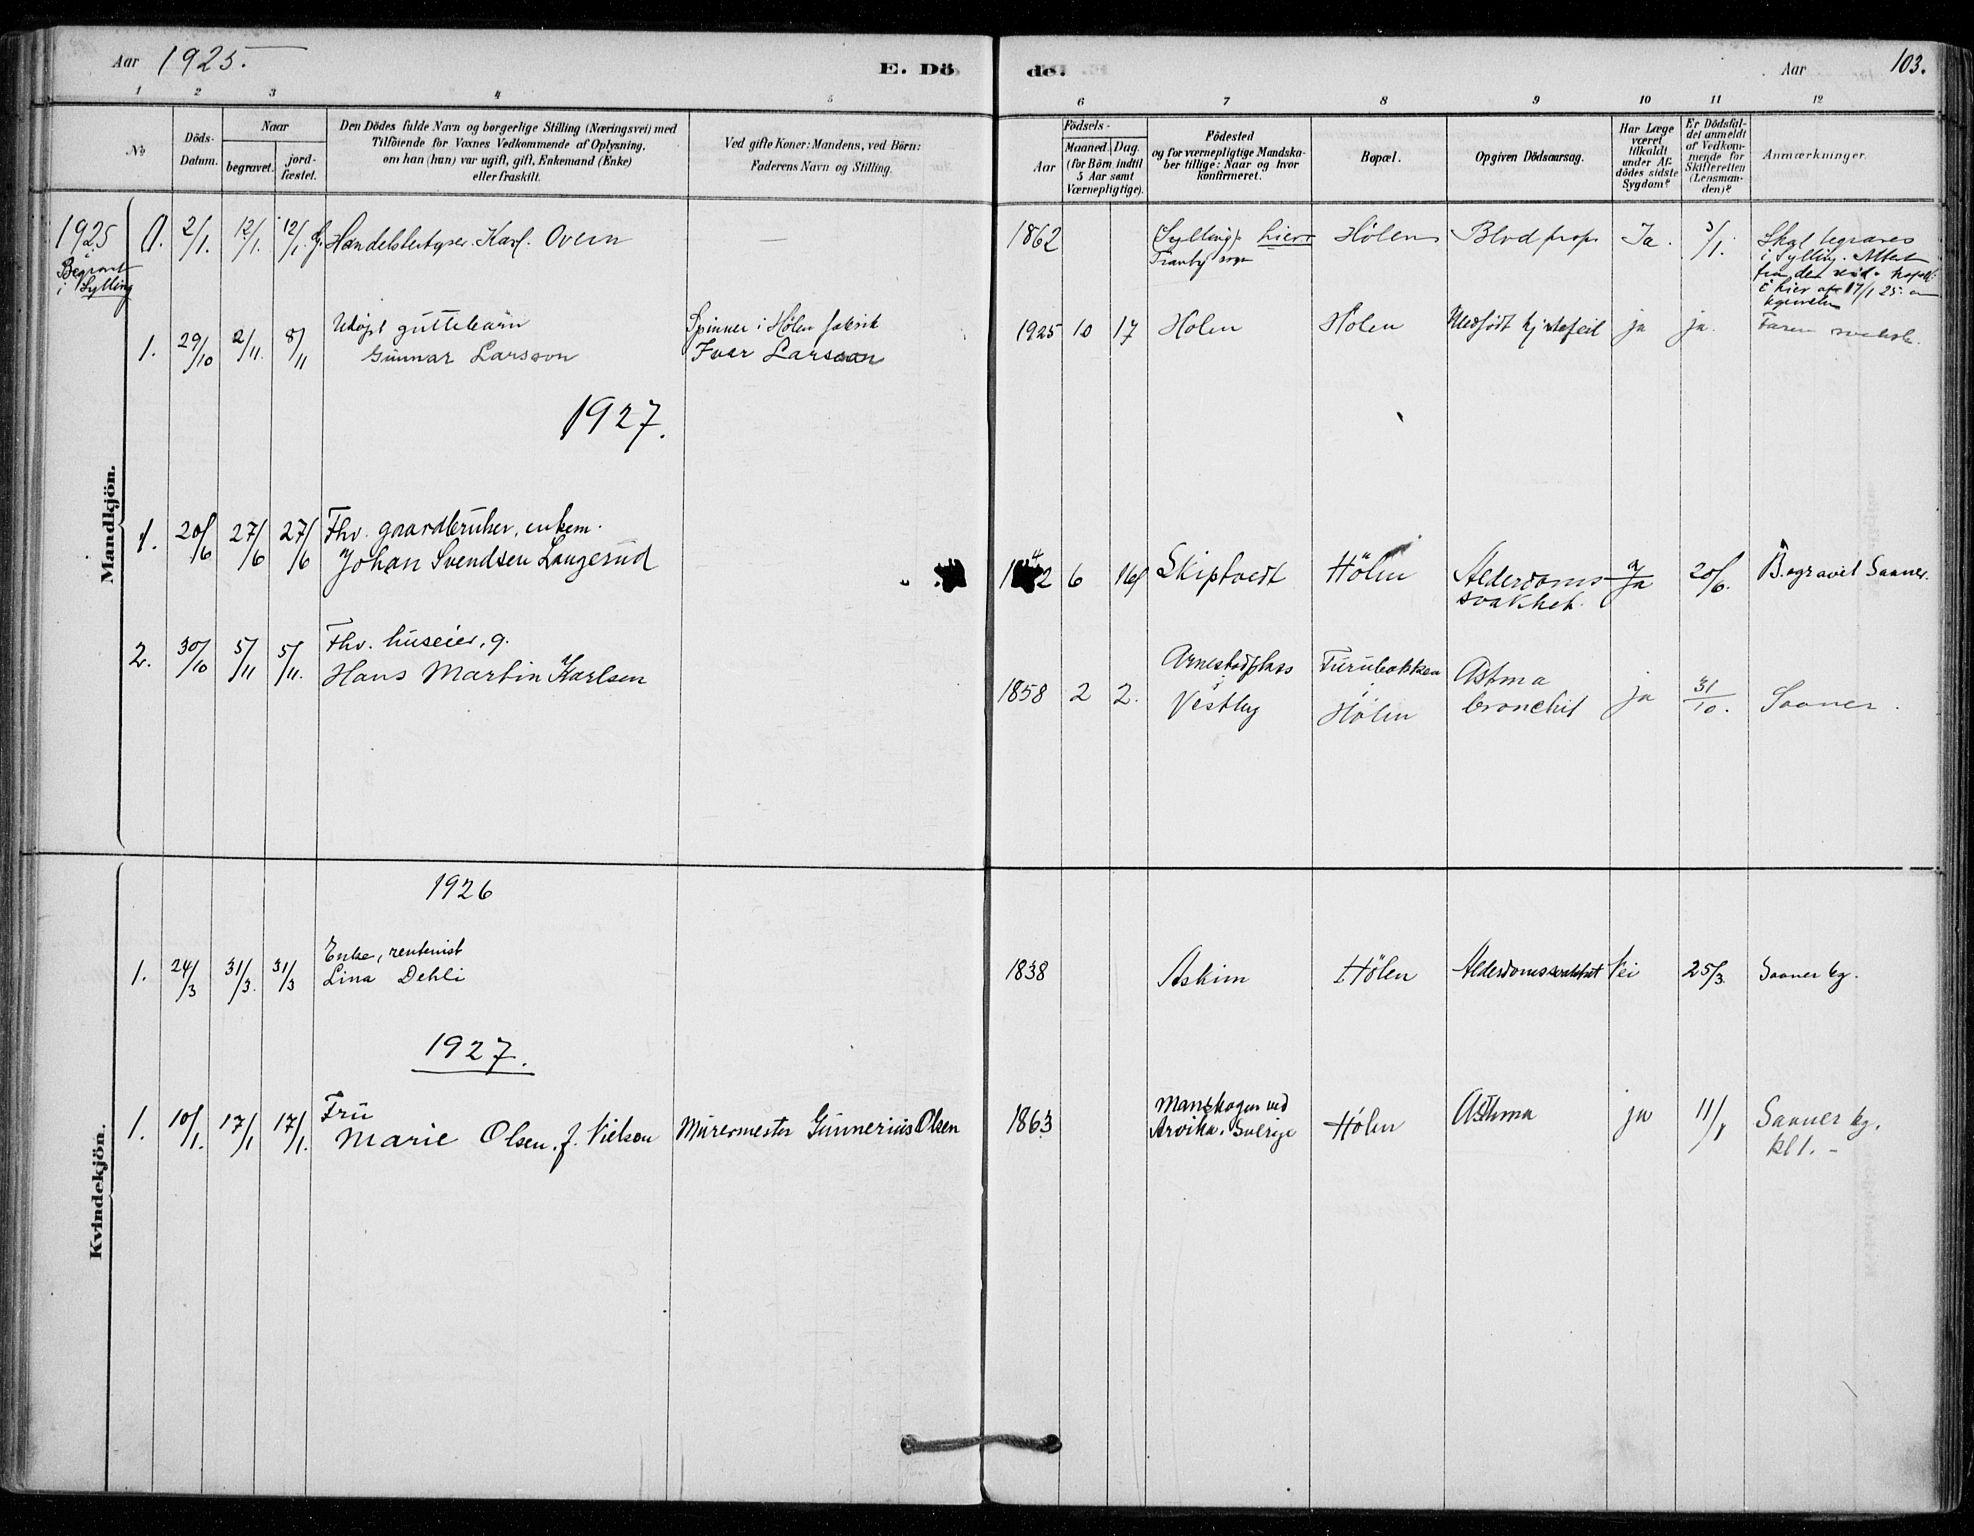 SAO, Vestby prestekontor Kirkebøker, F/Fe/L0001: Ministerialbok nr. V 1, 1878-1931, s. 103